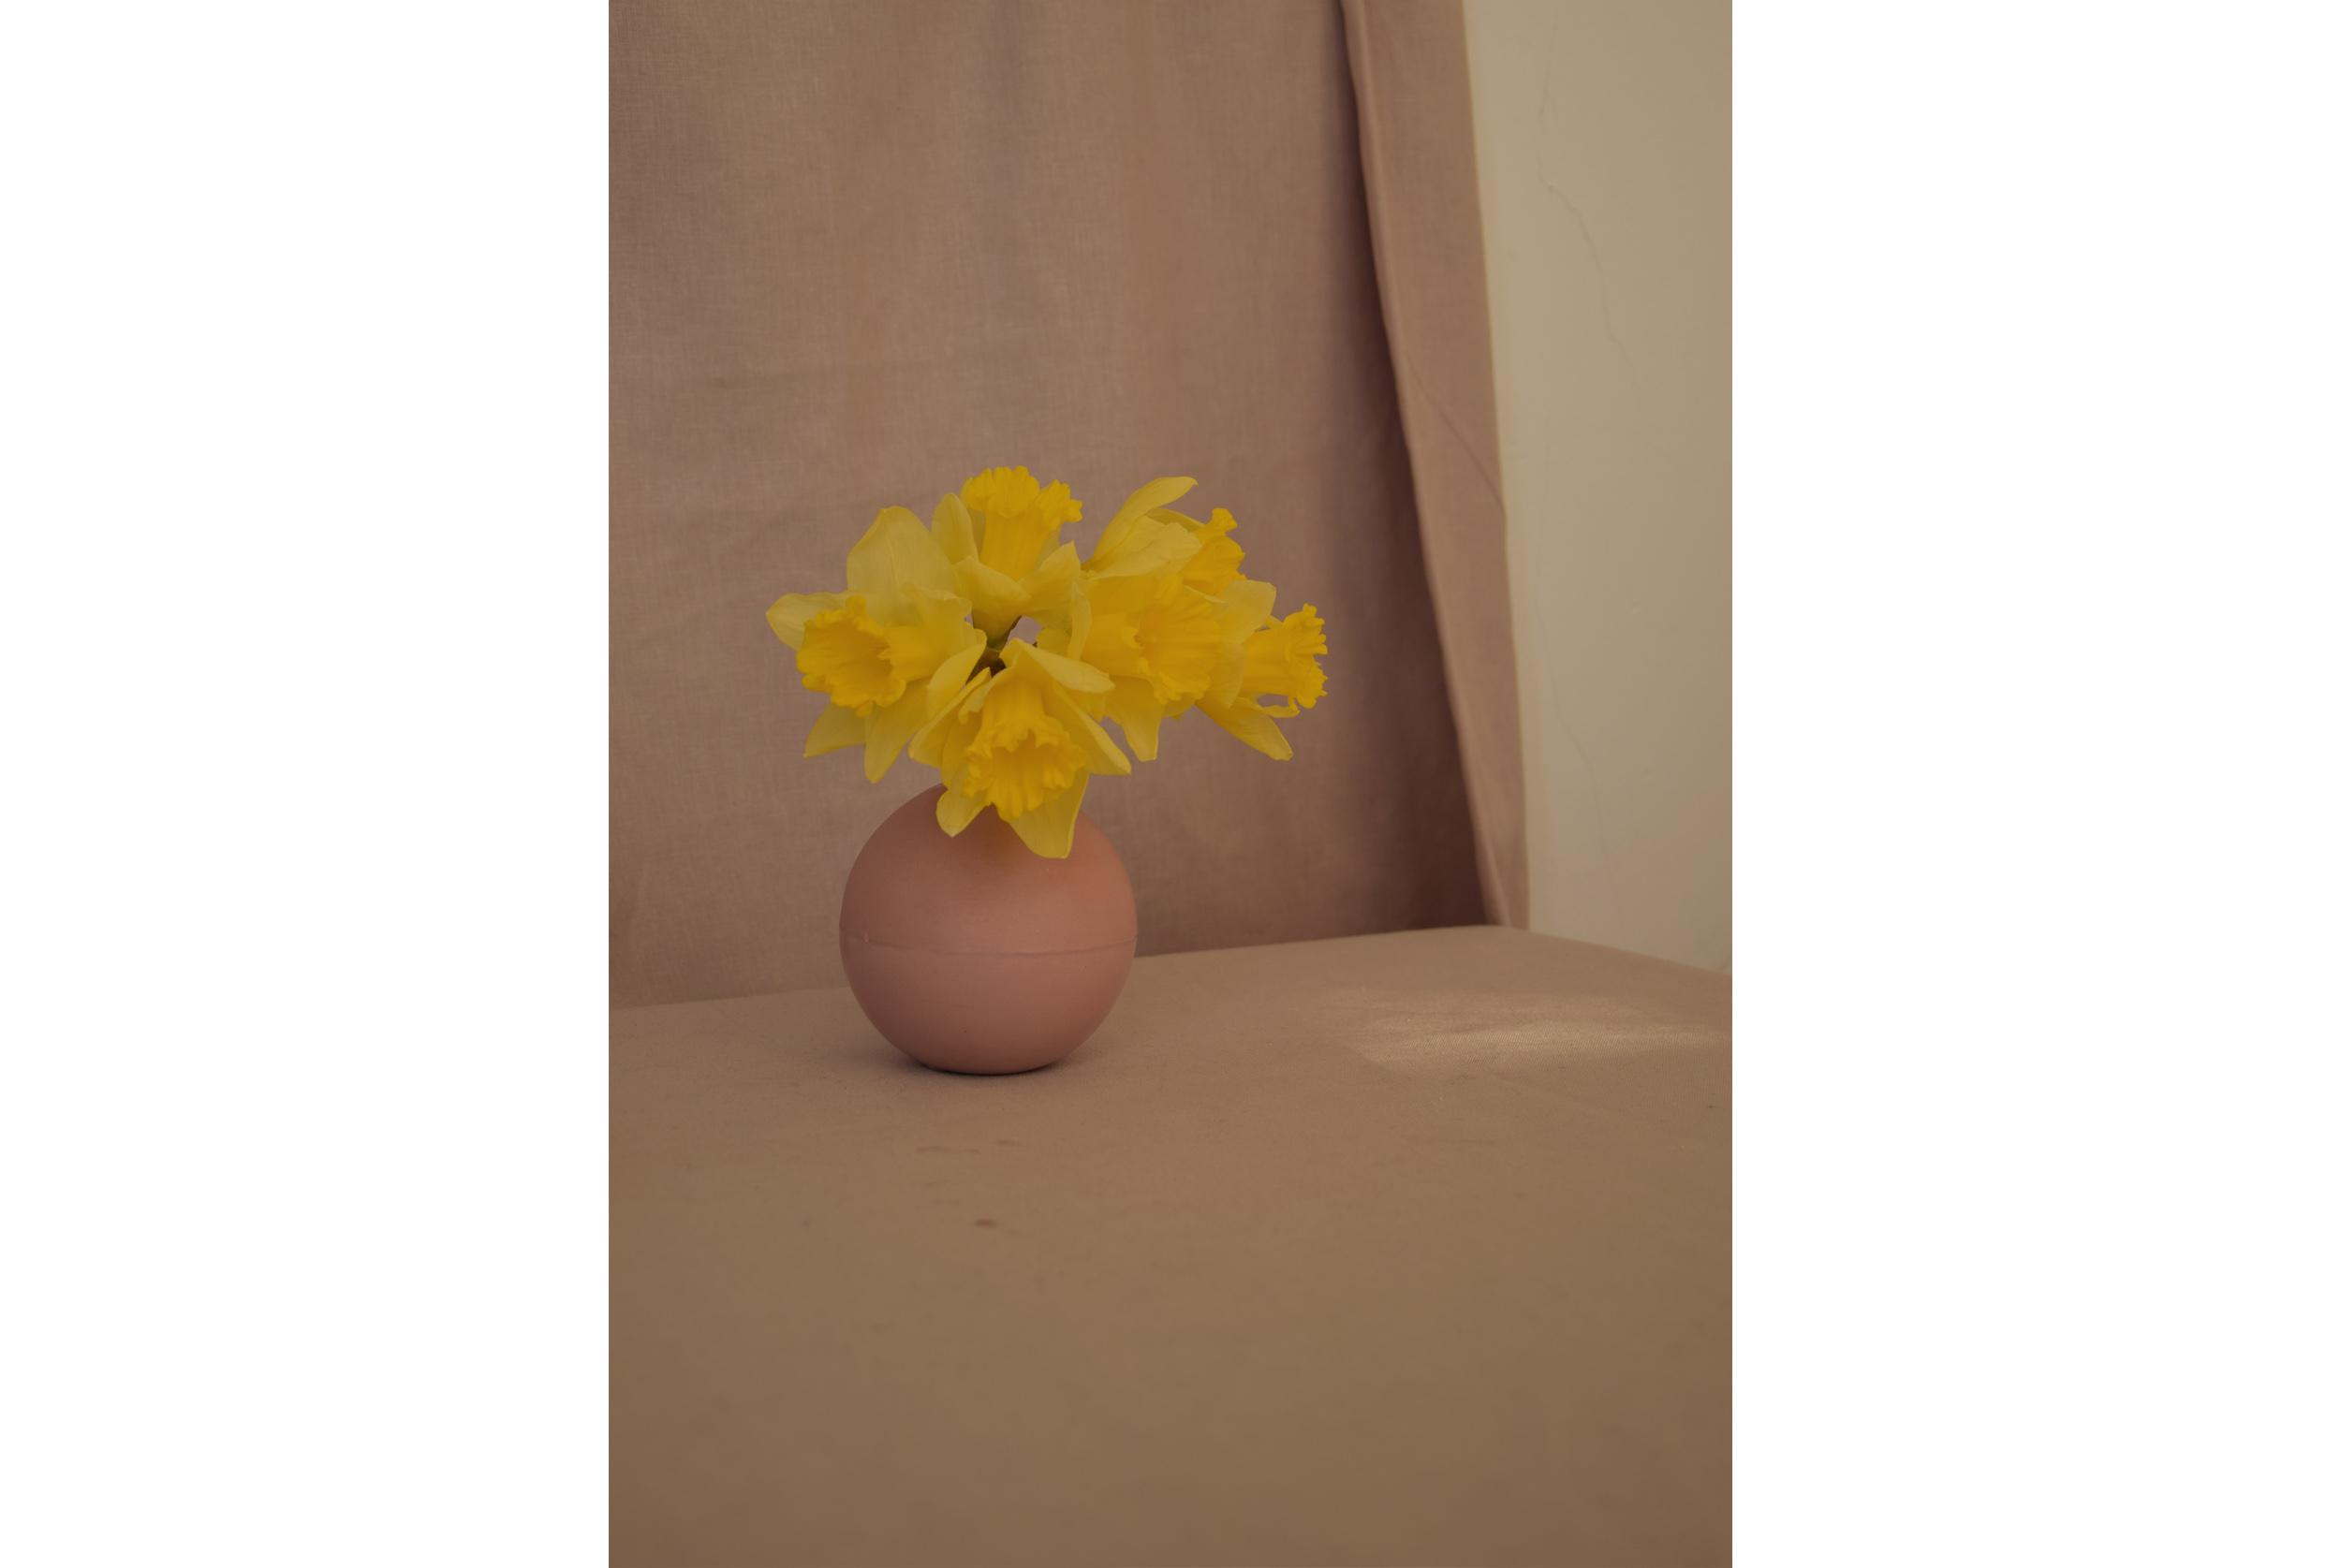 rosebowl-narcissus-studiokryszewski.jpg